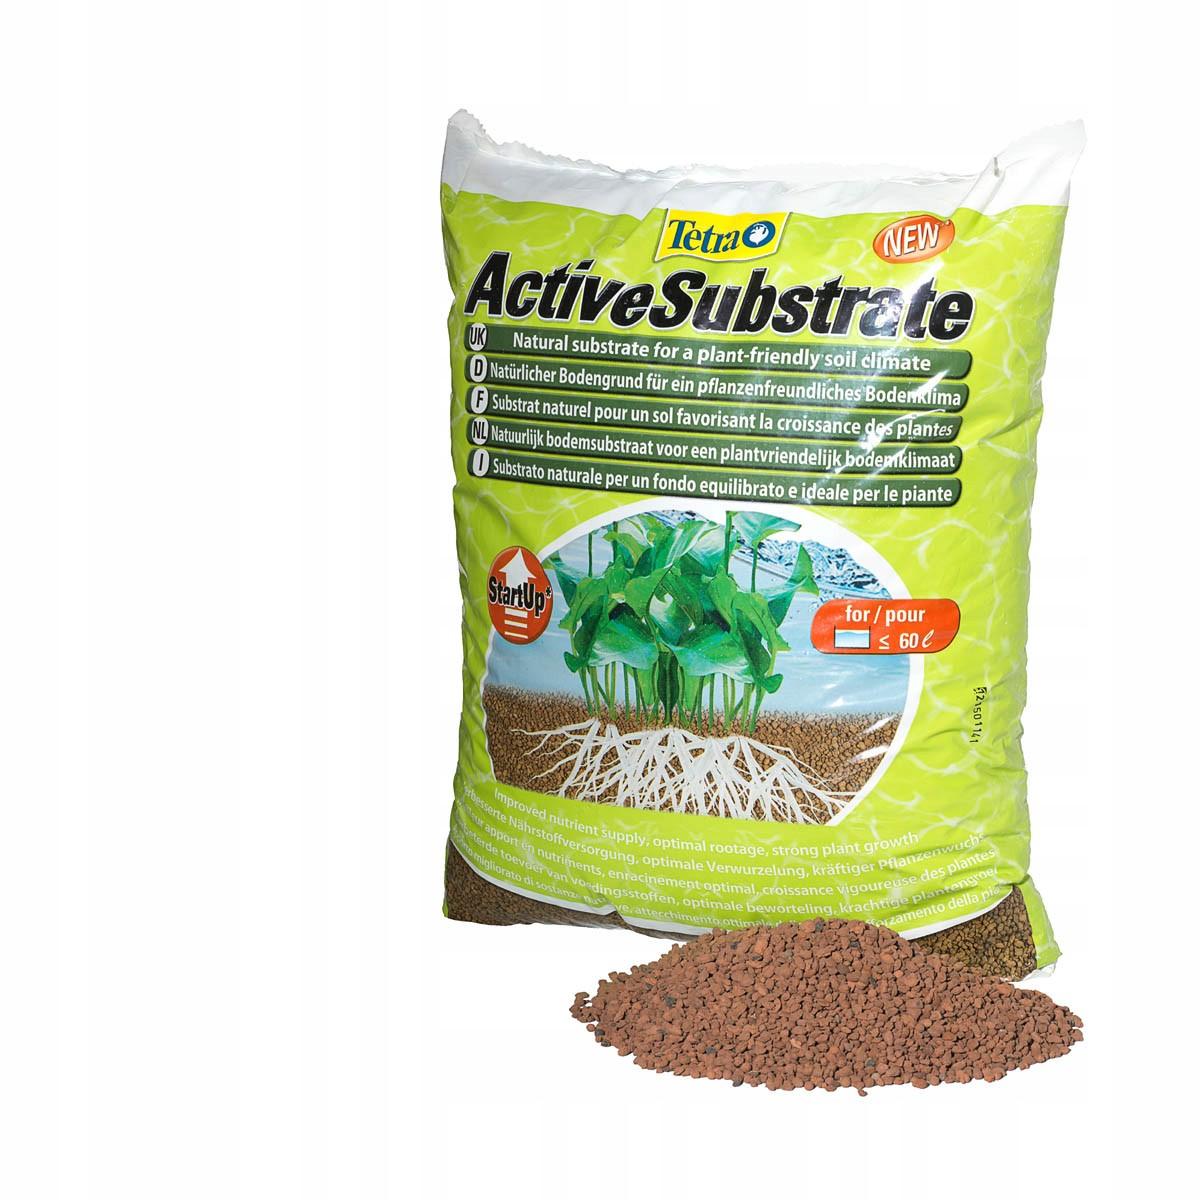 Tetra ActiveSubstrate 6L Substrát pre rastliny,